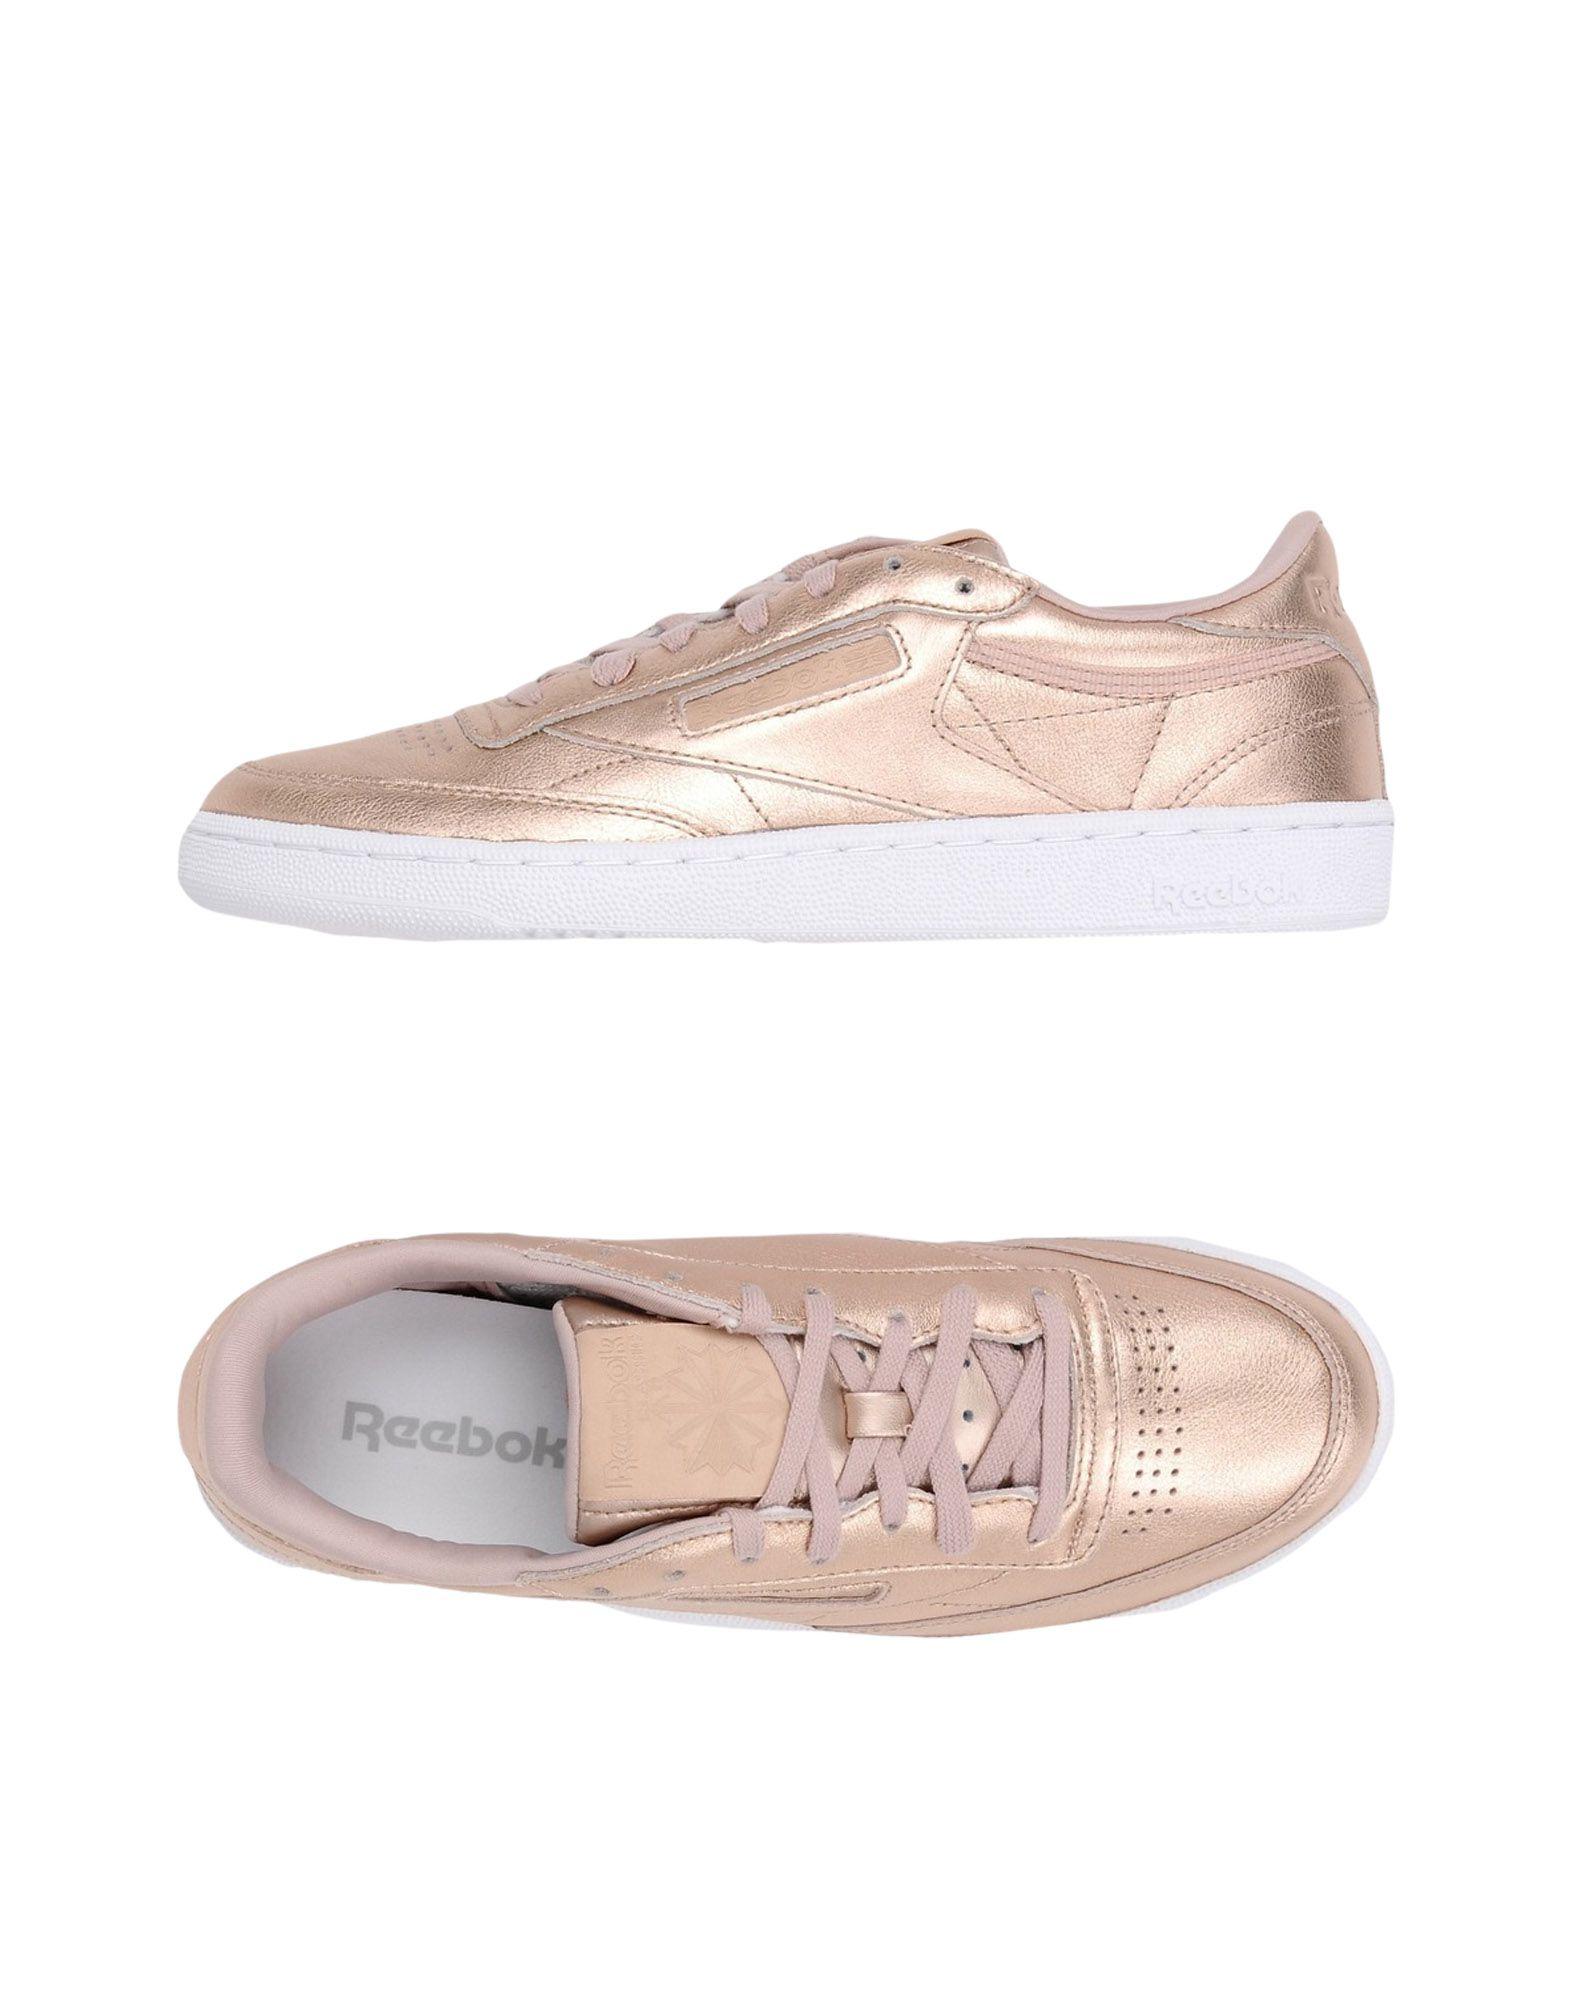 Reebok Club C 85 Lthr beliebte  11371842GT Gute Qualität beliebte Lthr Schuhe f415e6